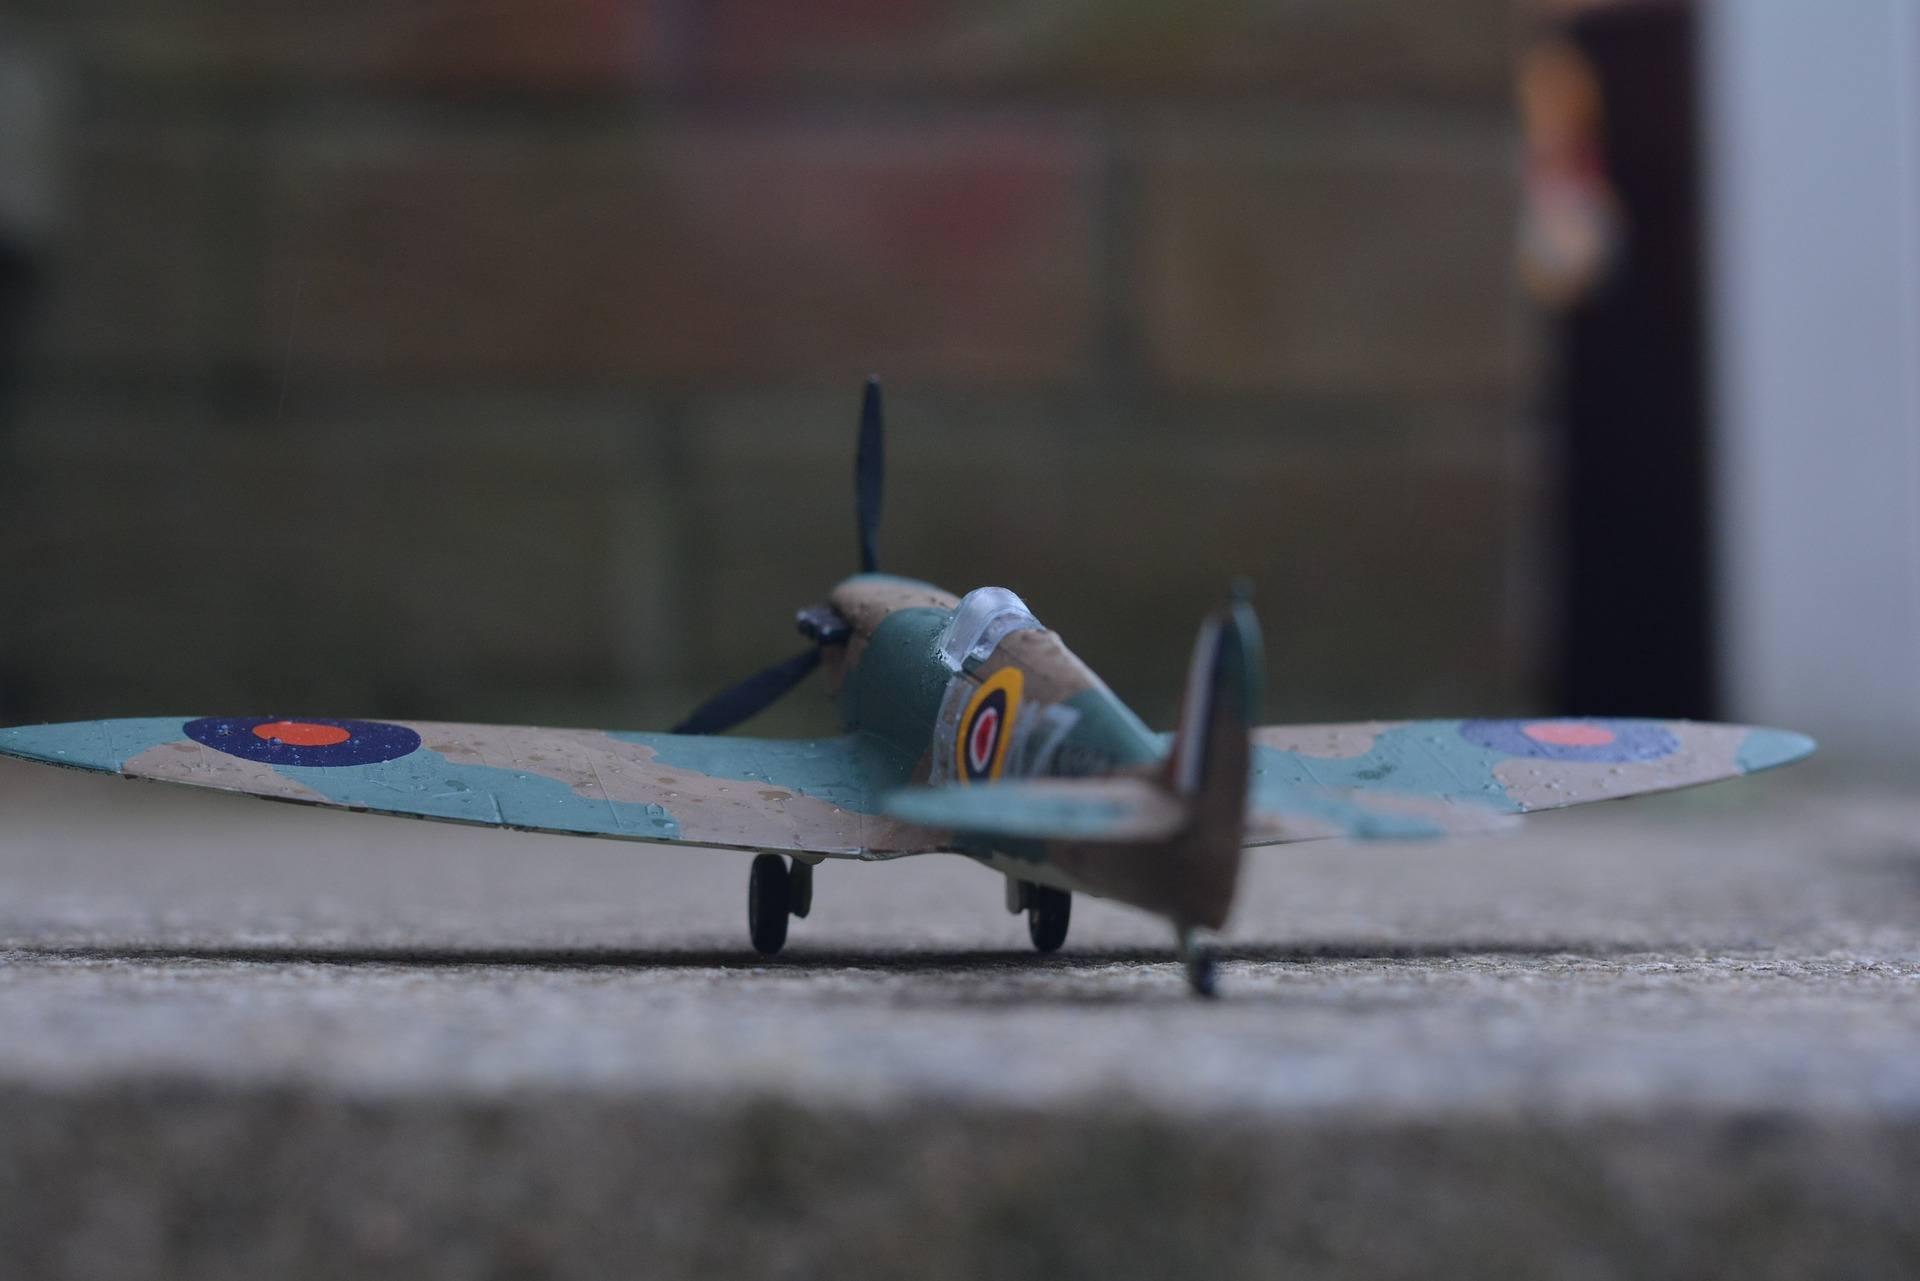 Polystyrene model plane